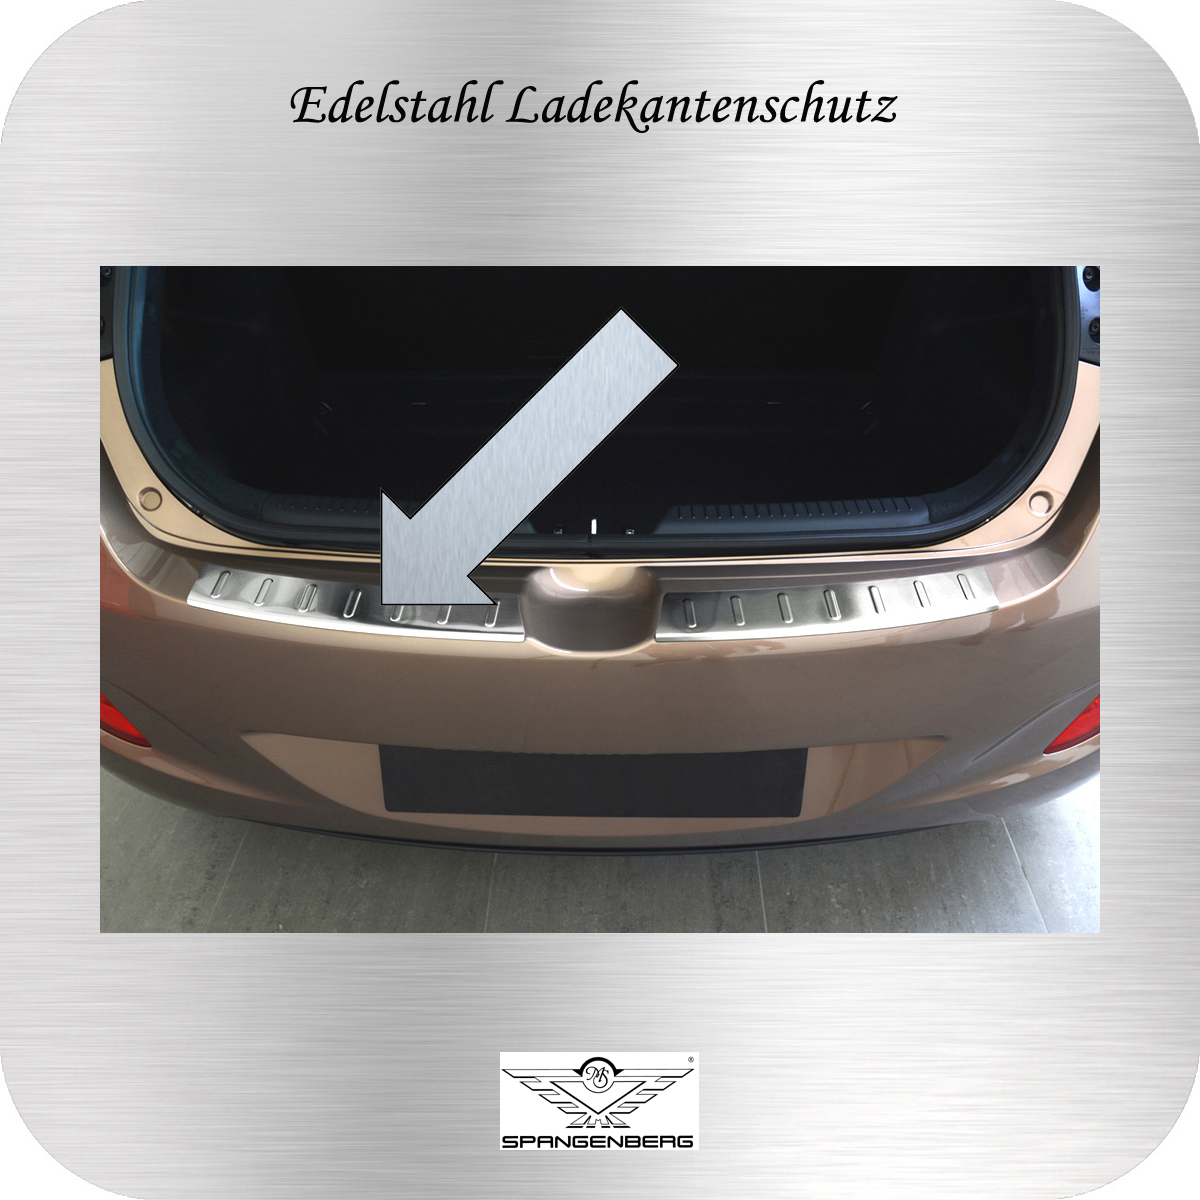 Ladekantenschutz Edelstahl Hyundai i30 5-Türer Typ GD 2012-17 3235628